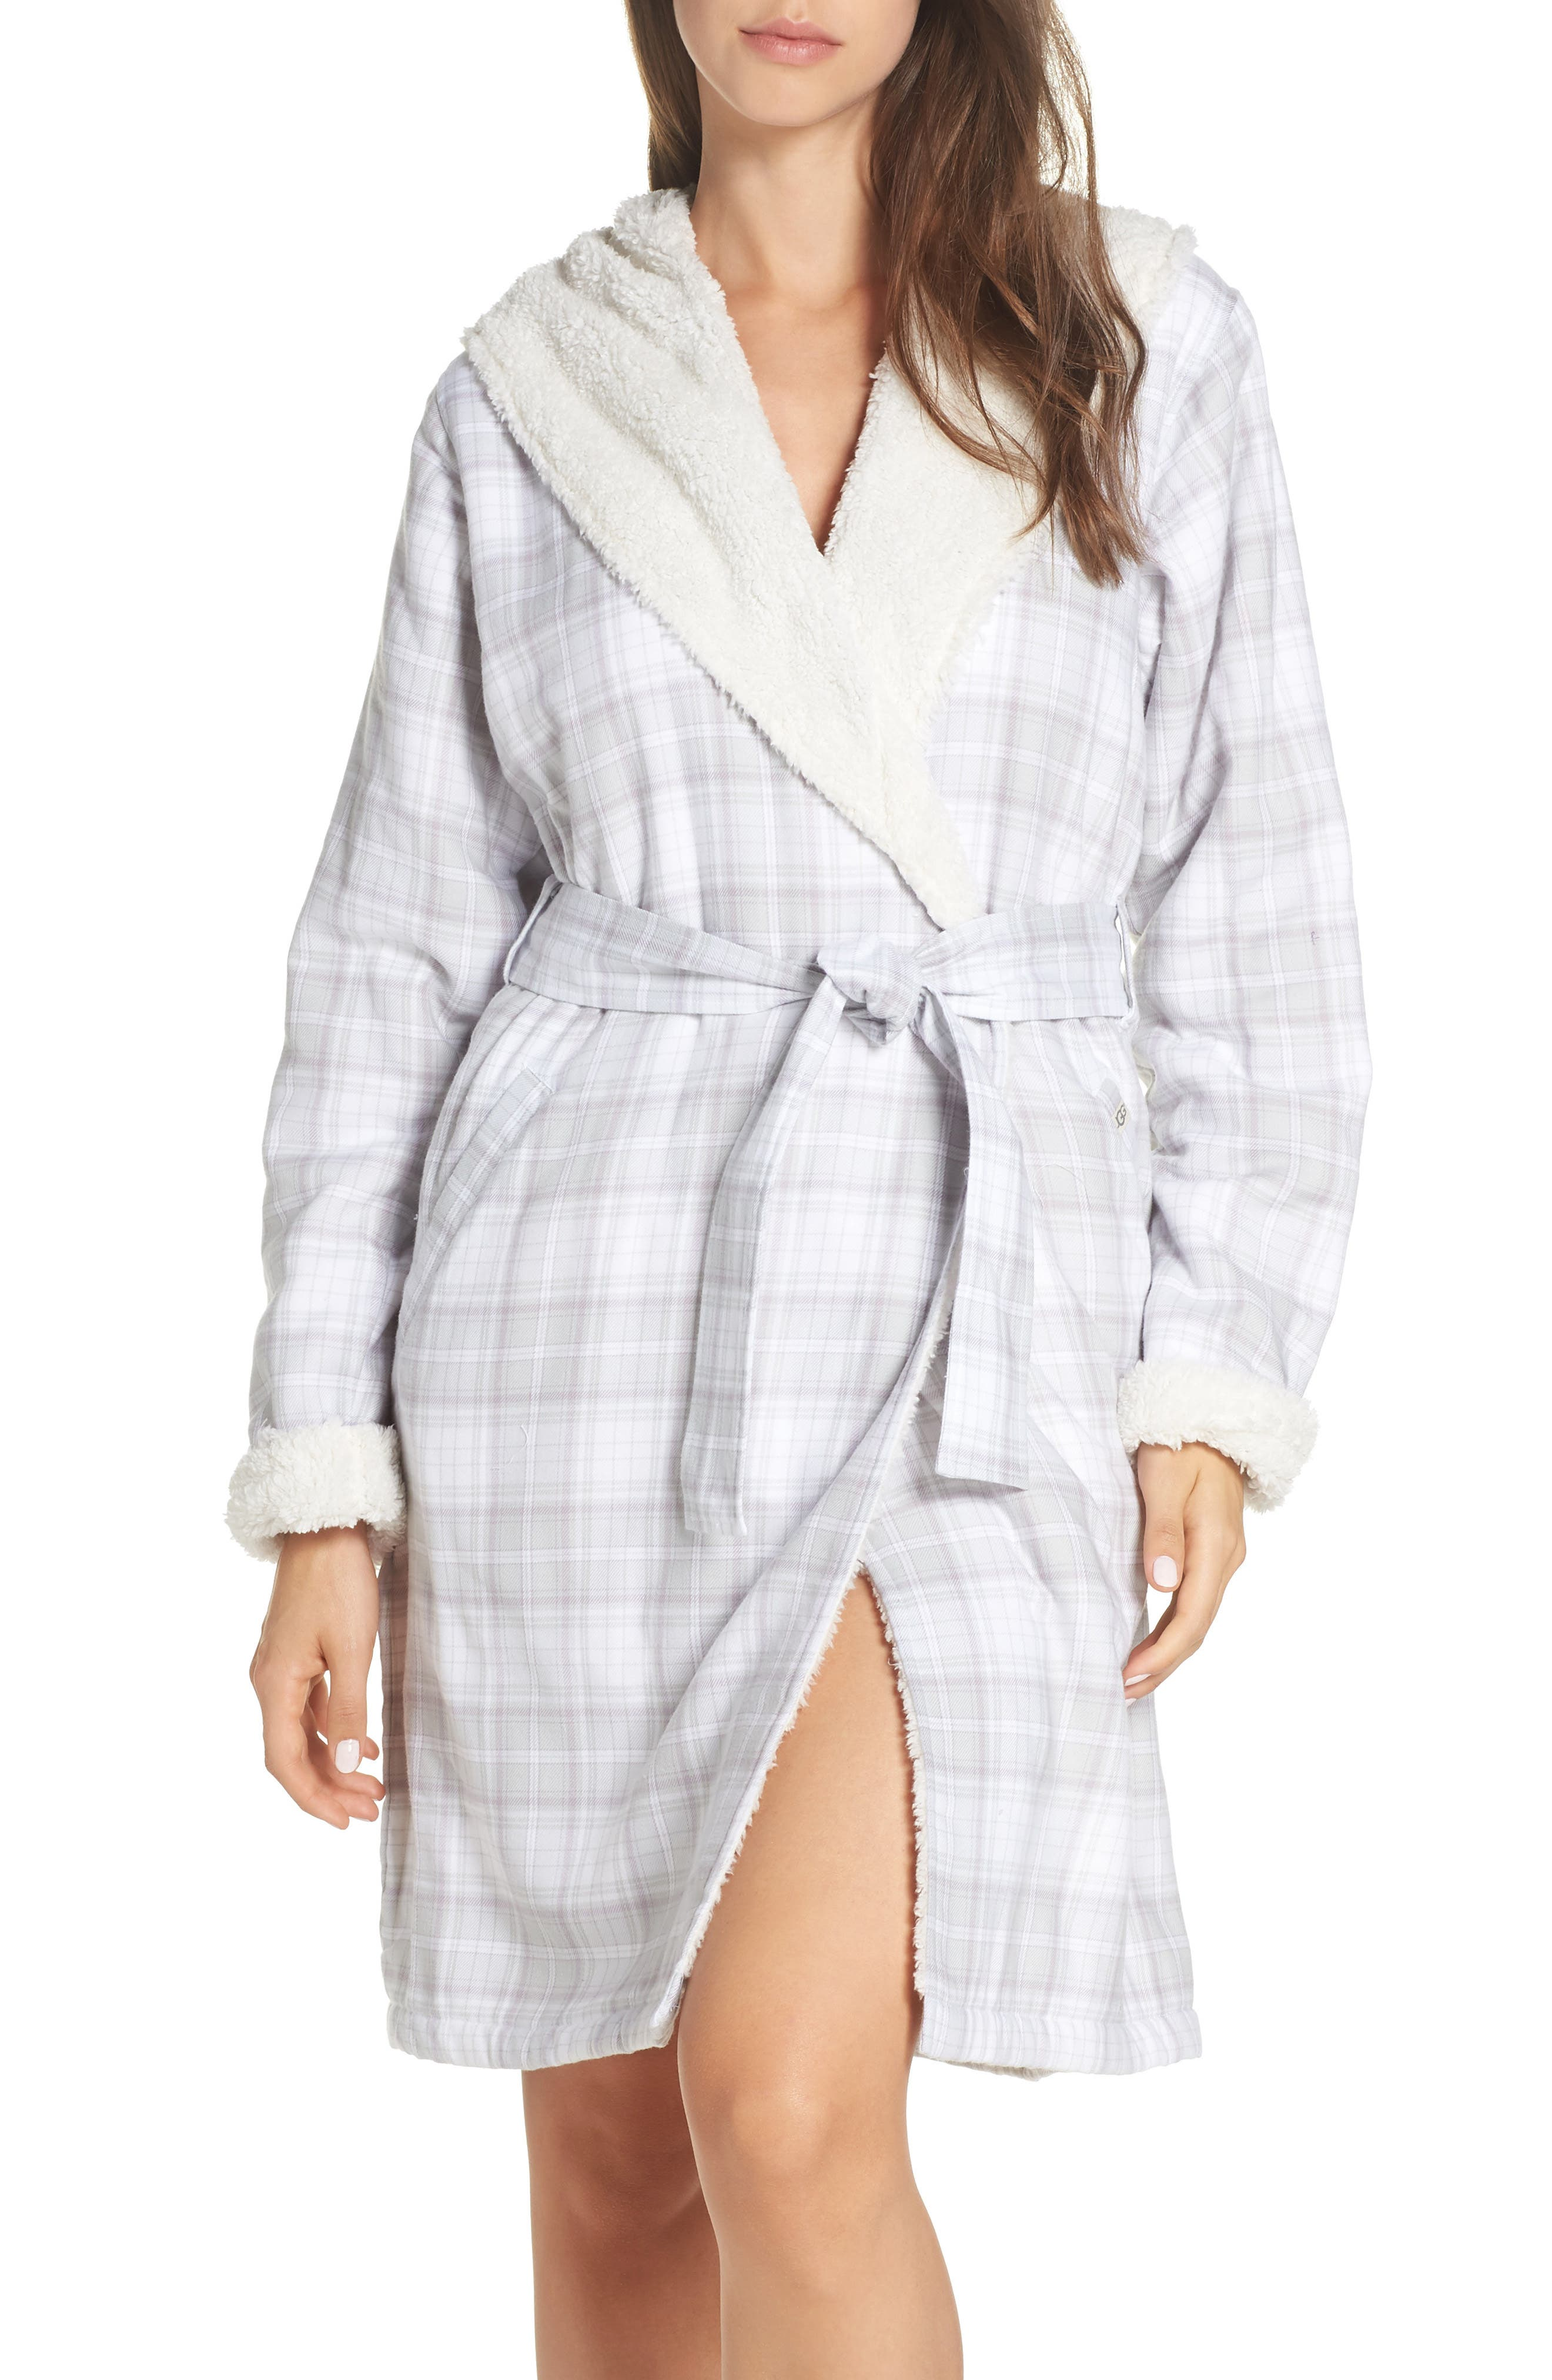 Anika Fleece Lined Flannel Robe,                             Main thumbnail 1, color,                             LAVENDER AURA PLAID